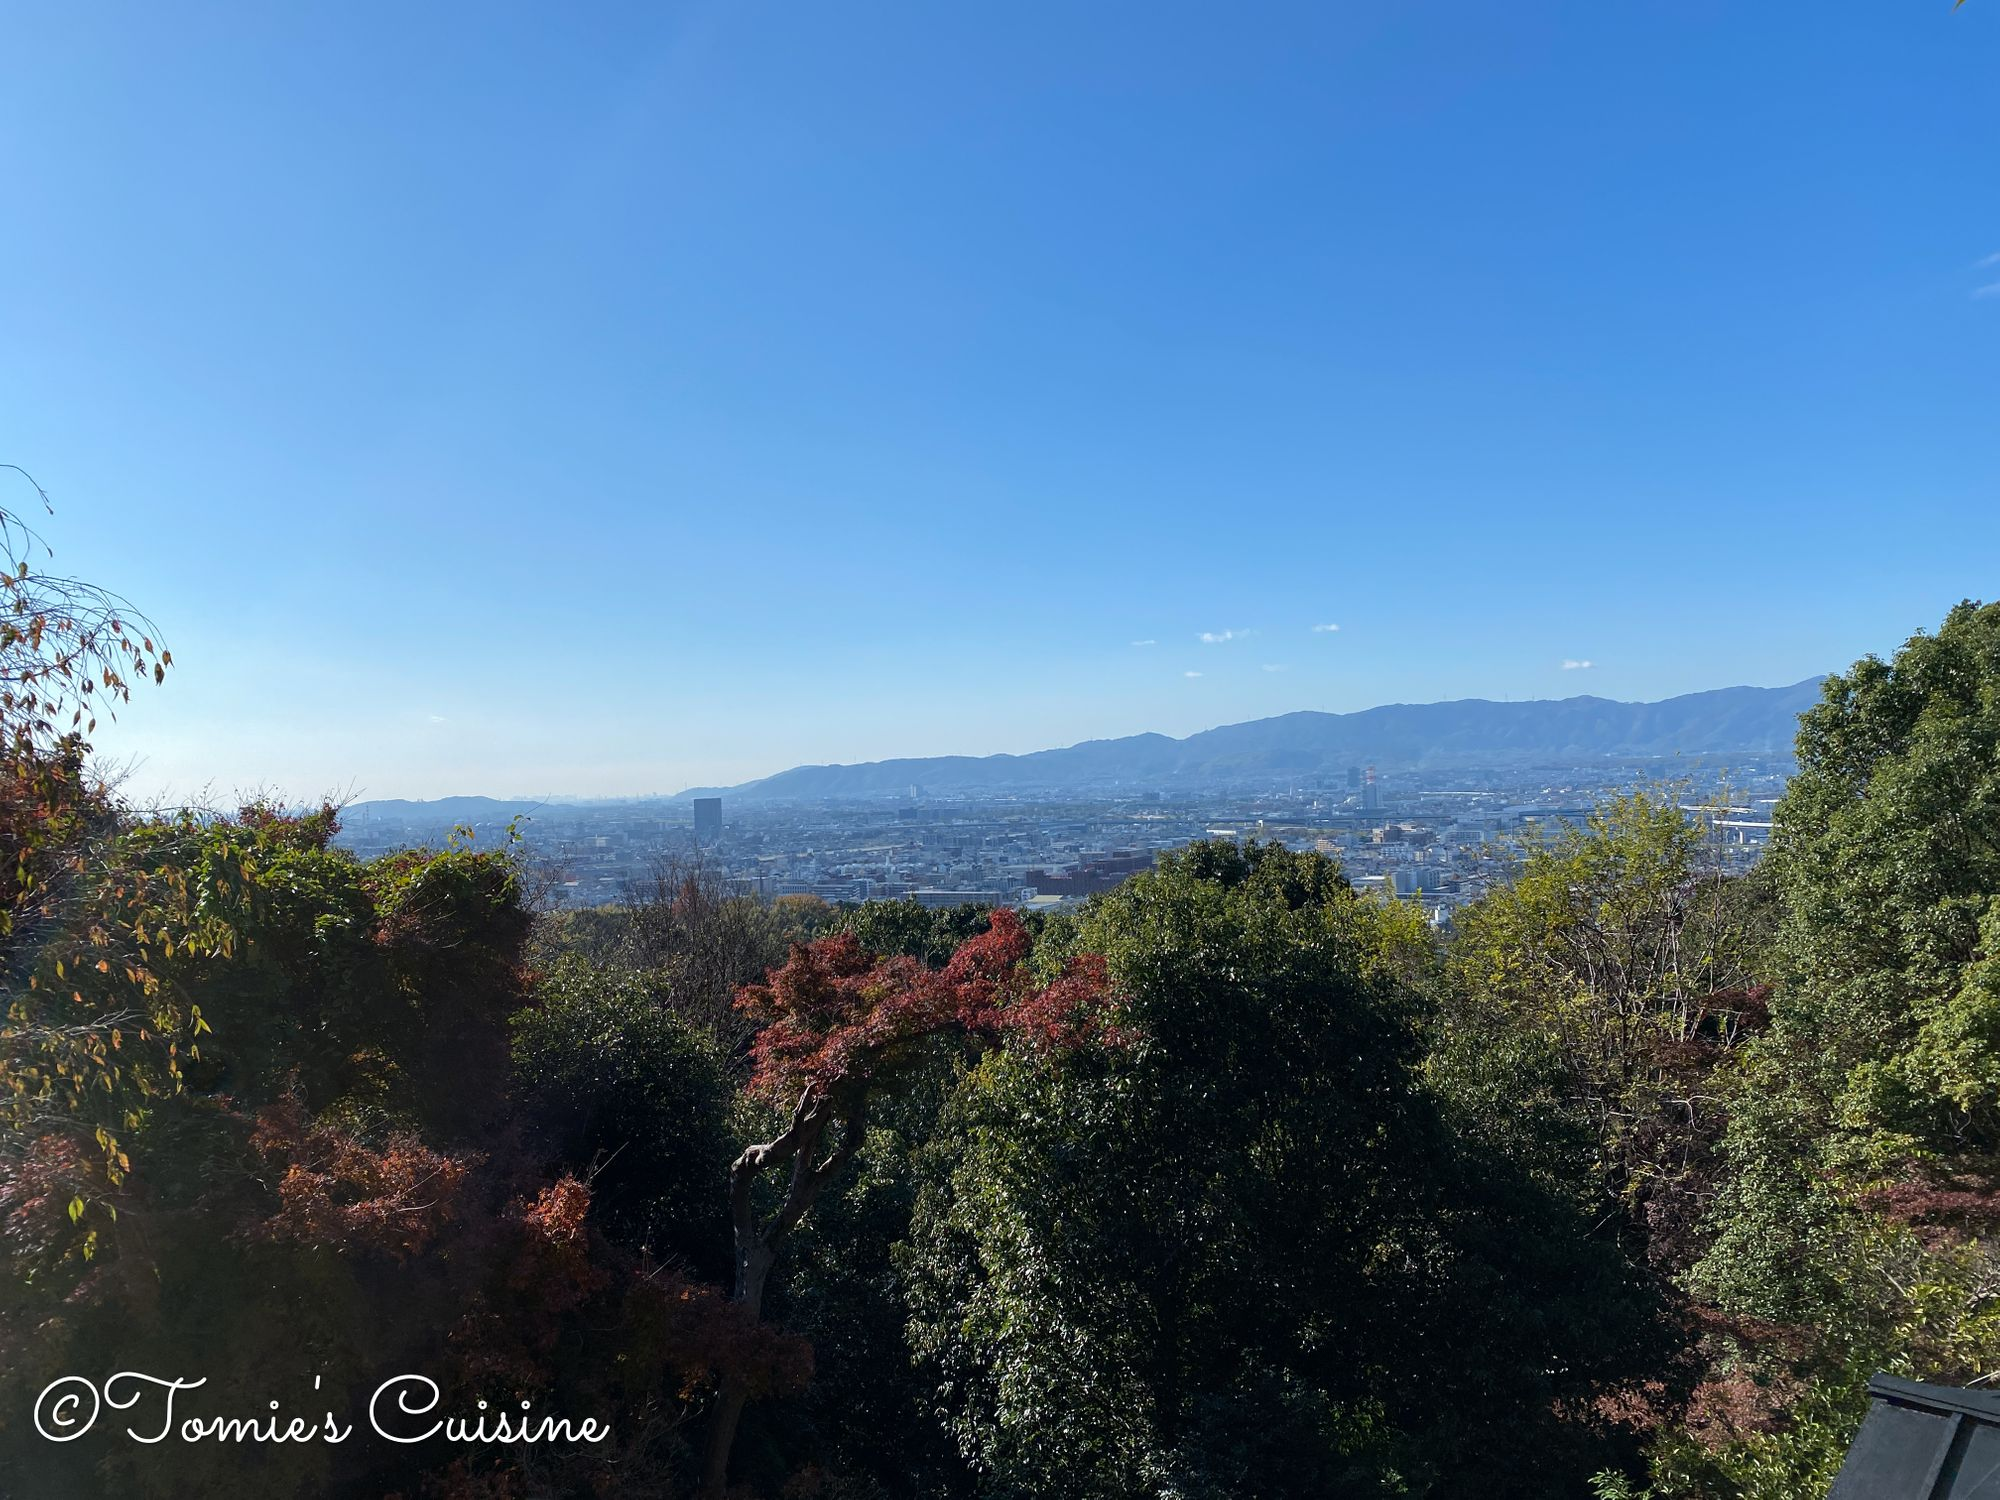 View from Yotsutsuji on South Kyoto